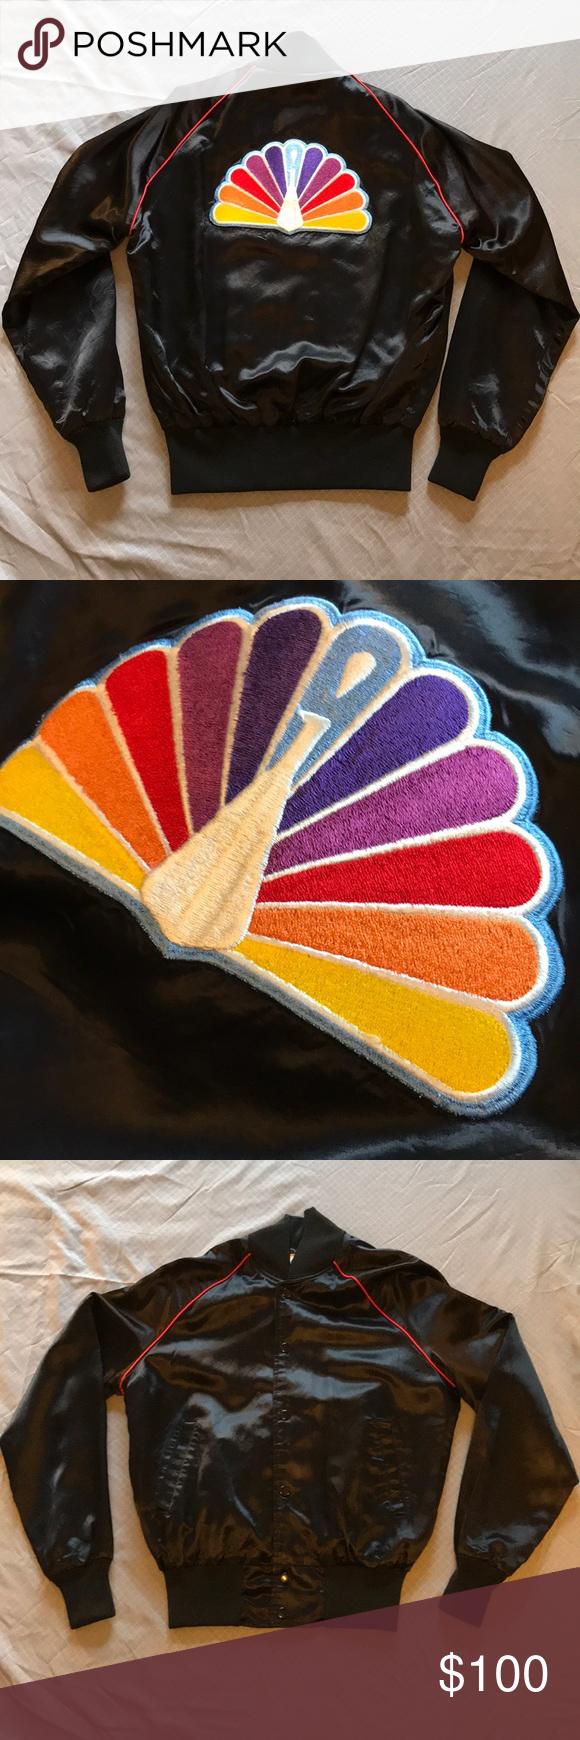 Vintage NBC Peacock Logo Satin Bomber Jacket Peacock